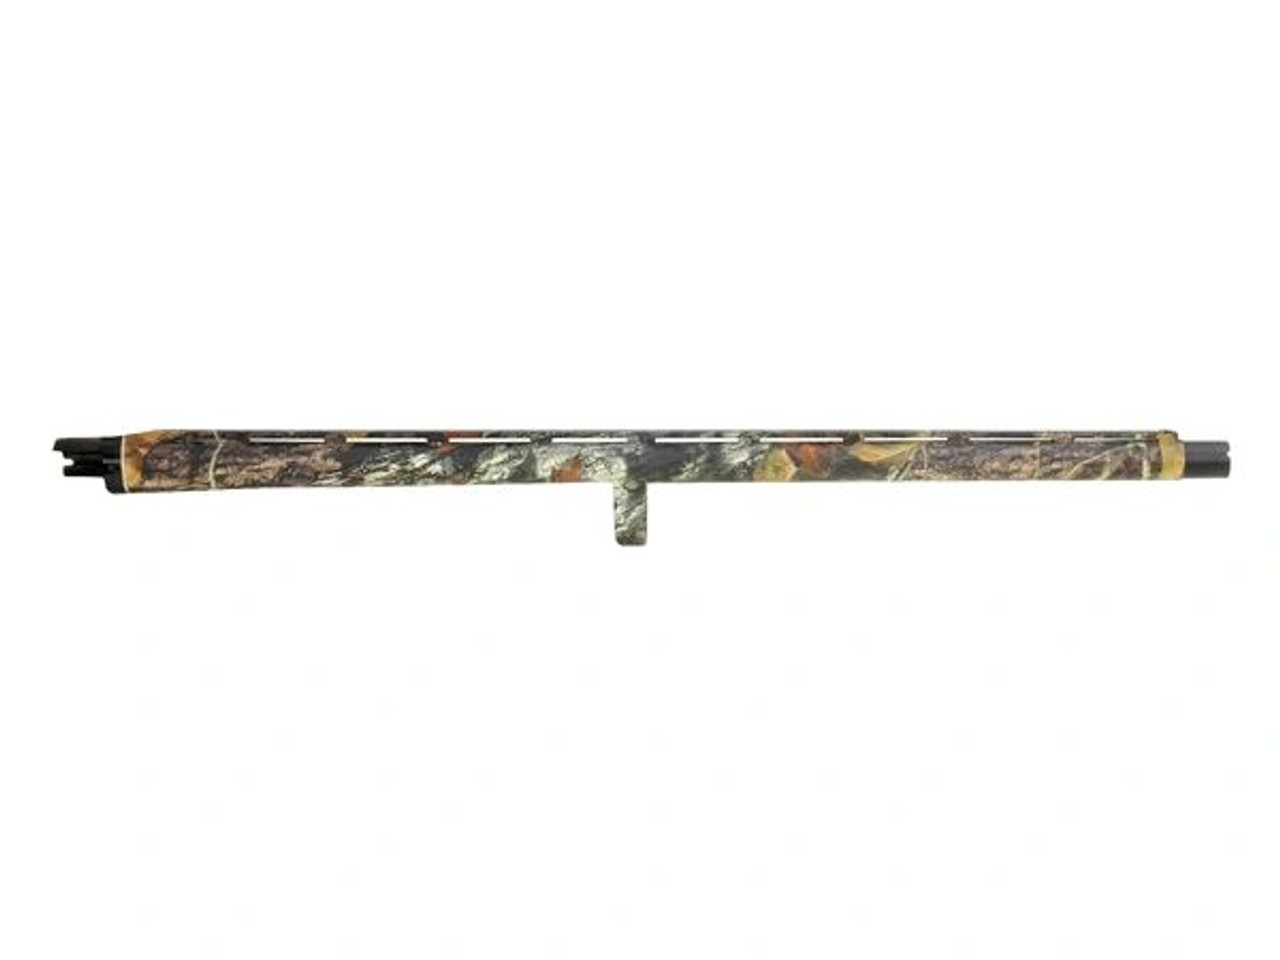 "Remington 12ga 870 Turkey Barrel, 23"" Vent Hi Viz Ivory Bead Sight, Extended Extra Full Turkey Choke"